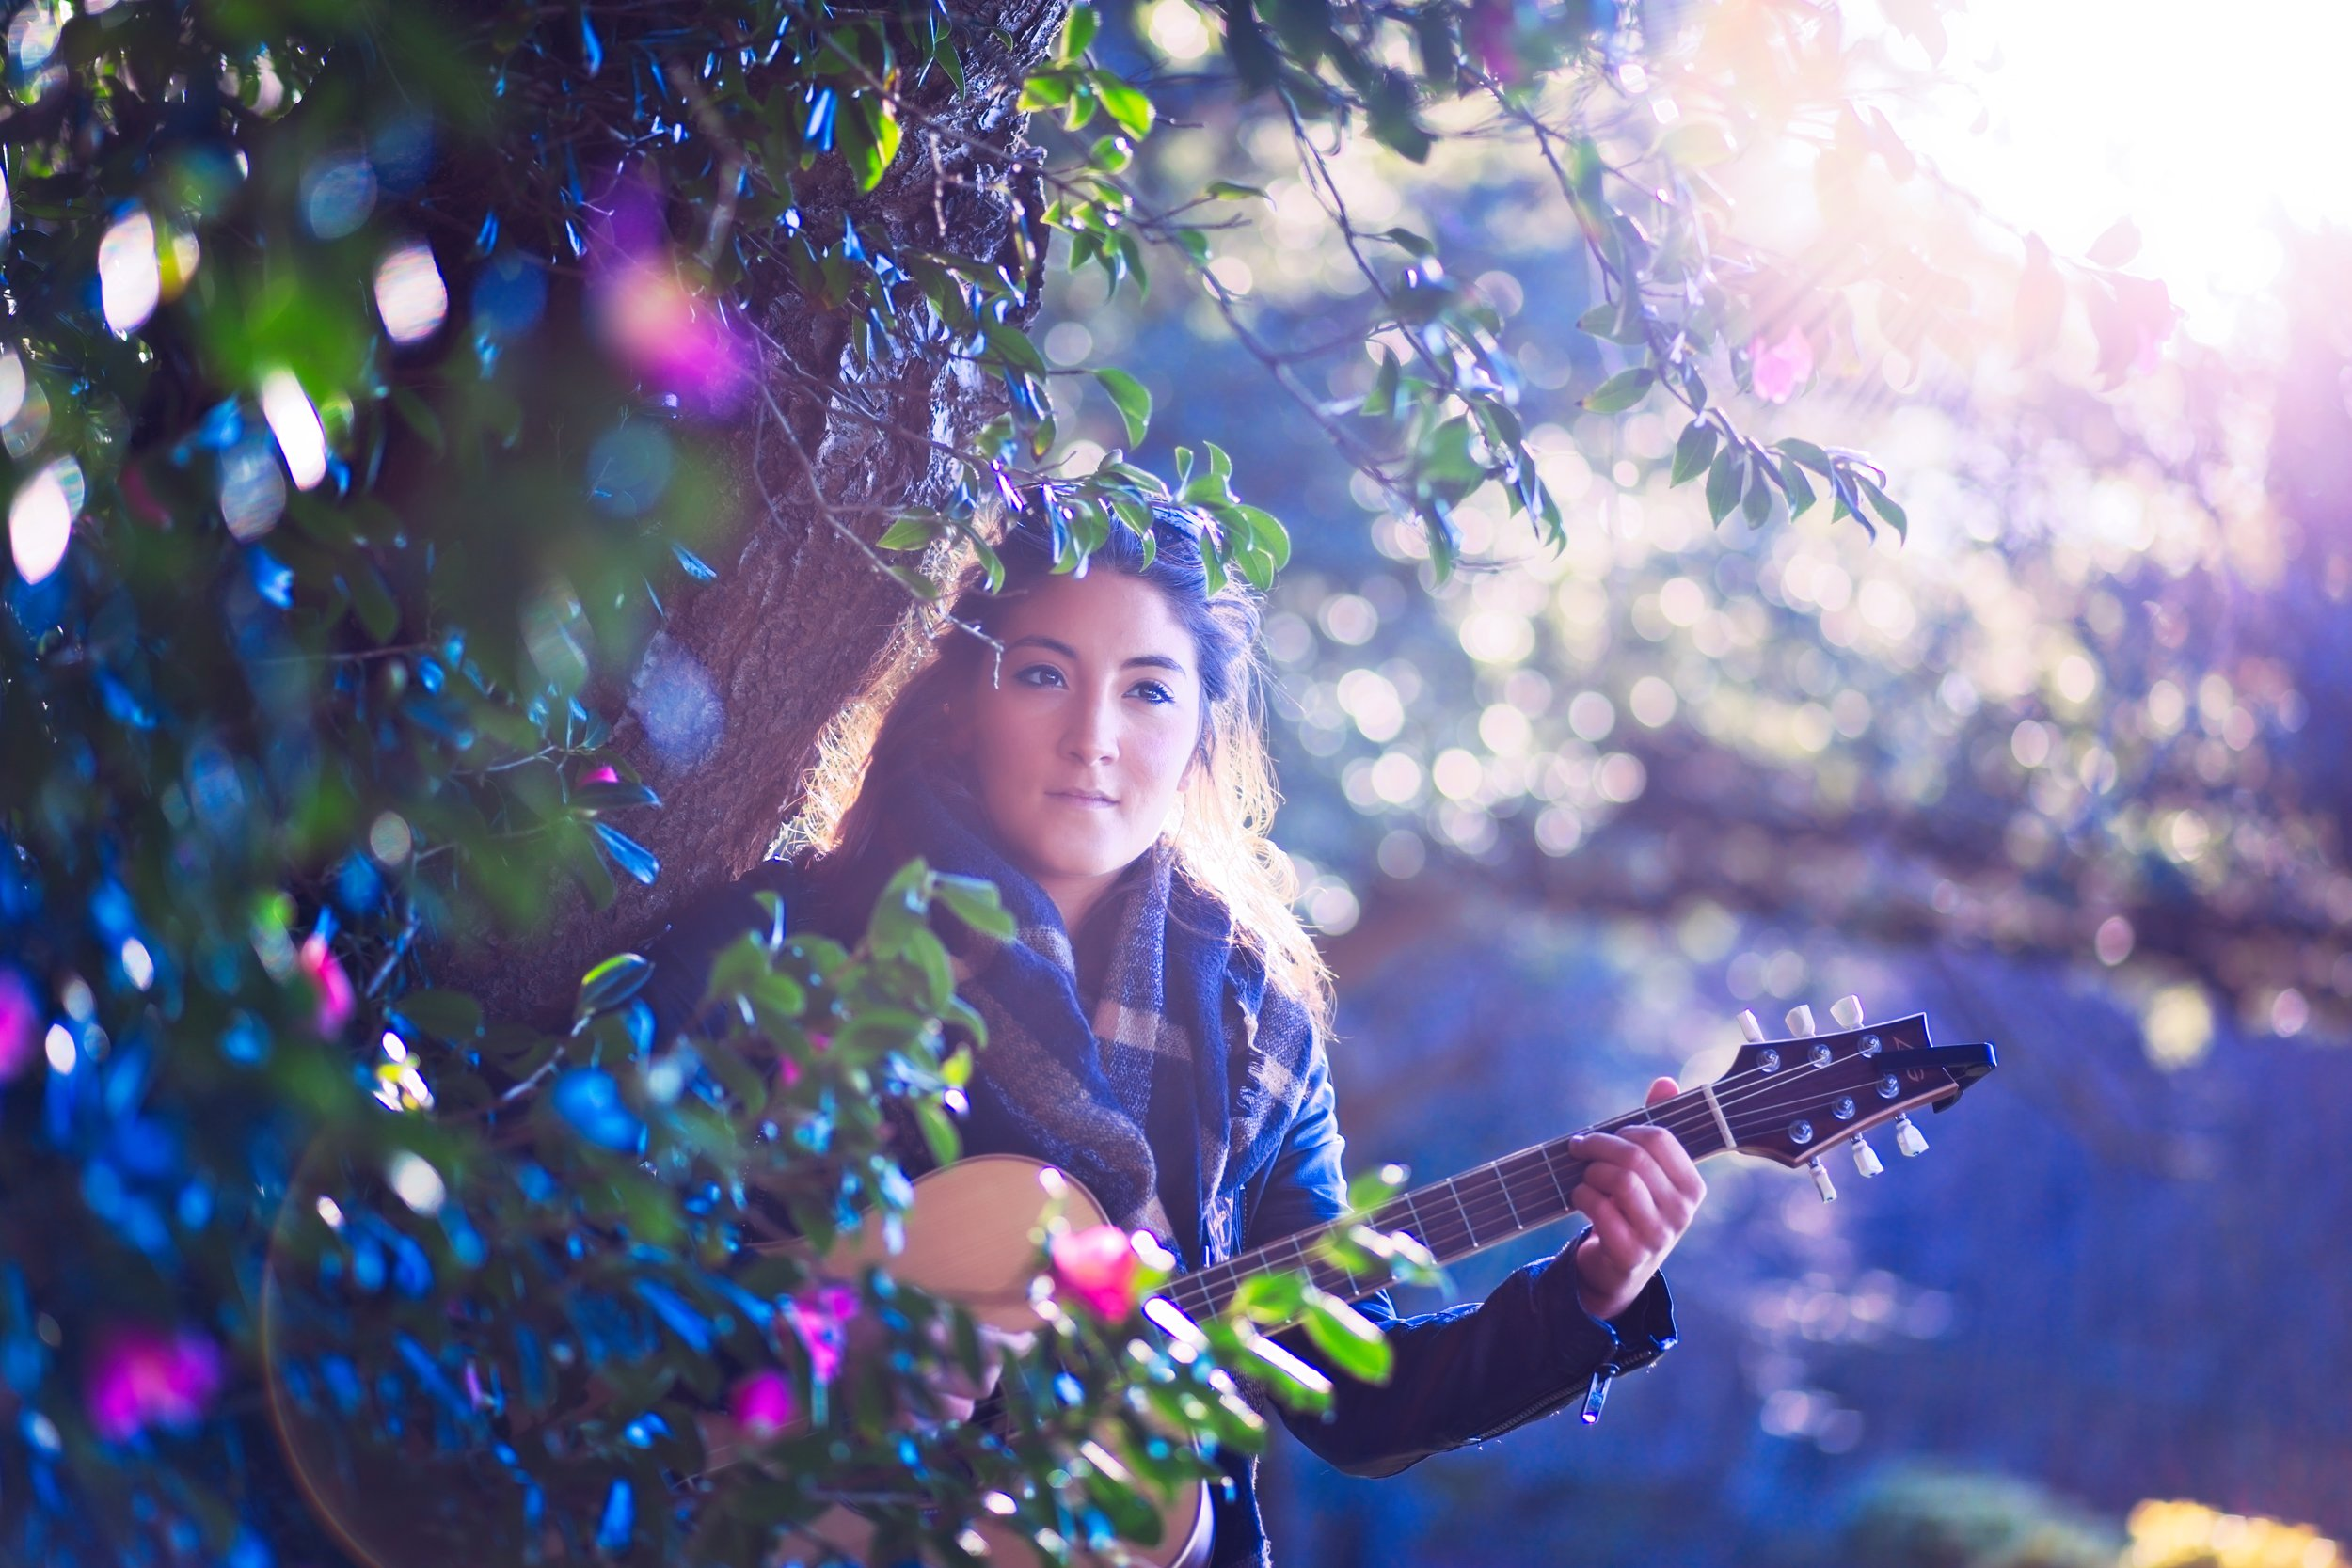 guitarist-singer